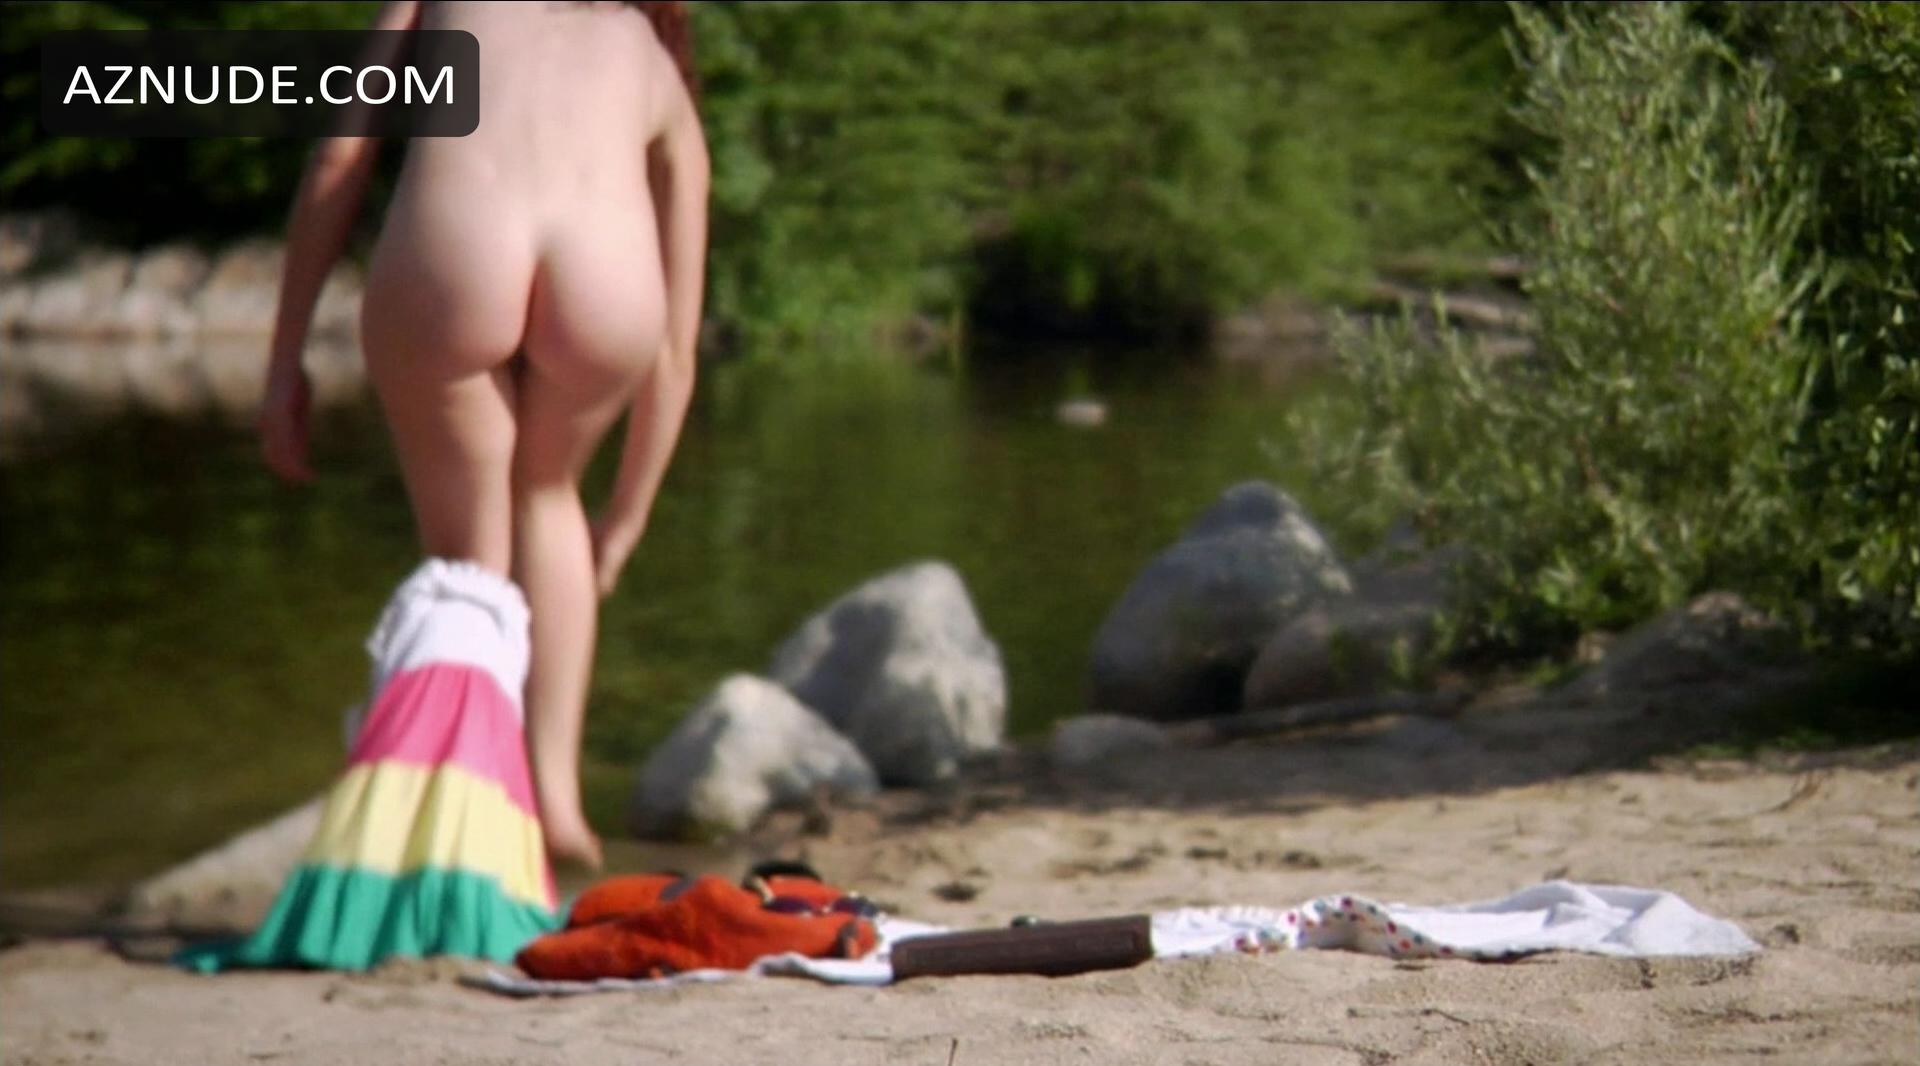 Leah hall naked act naturally